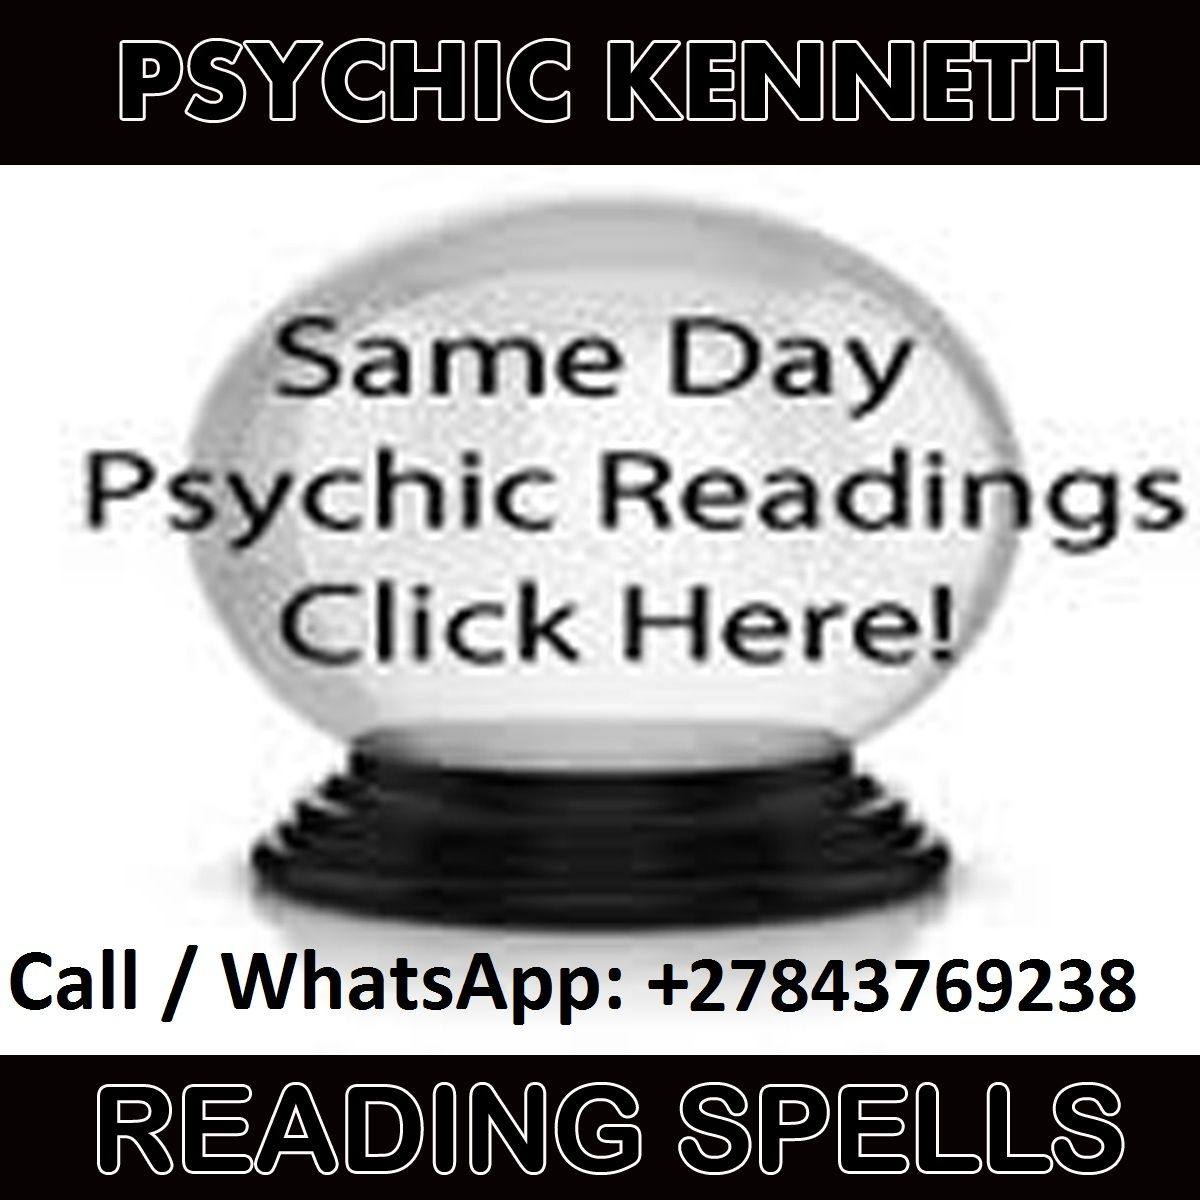 Simple divorce spells Call / WhatsApp +27843769238 - Psychic love reading, Spells that really work, Love psychic - 웹